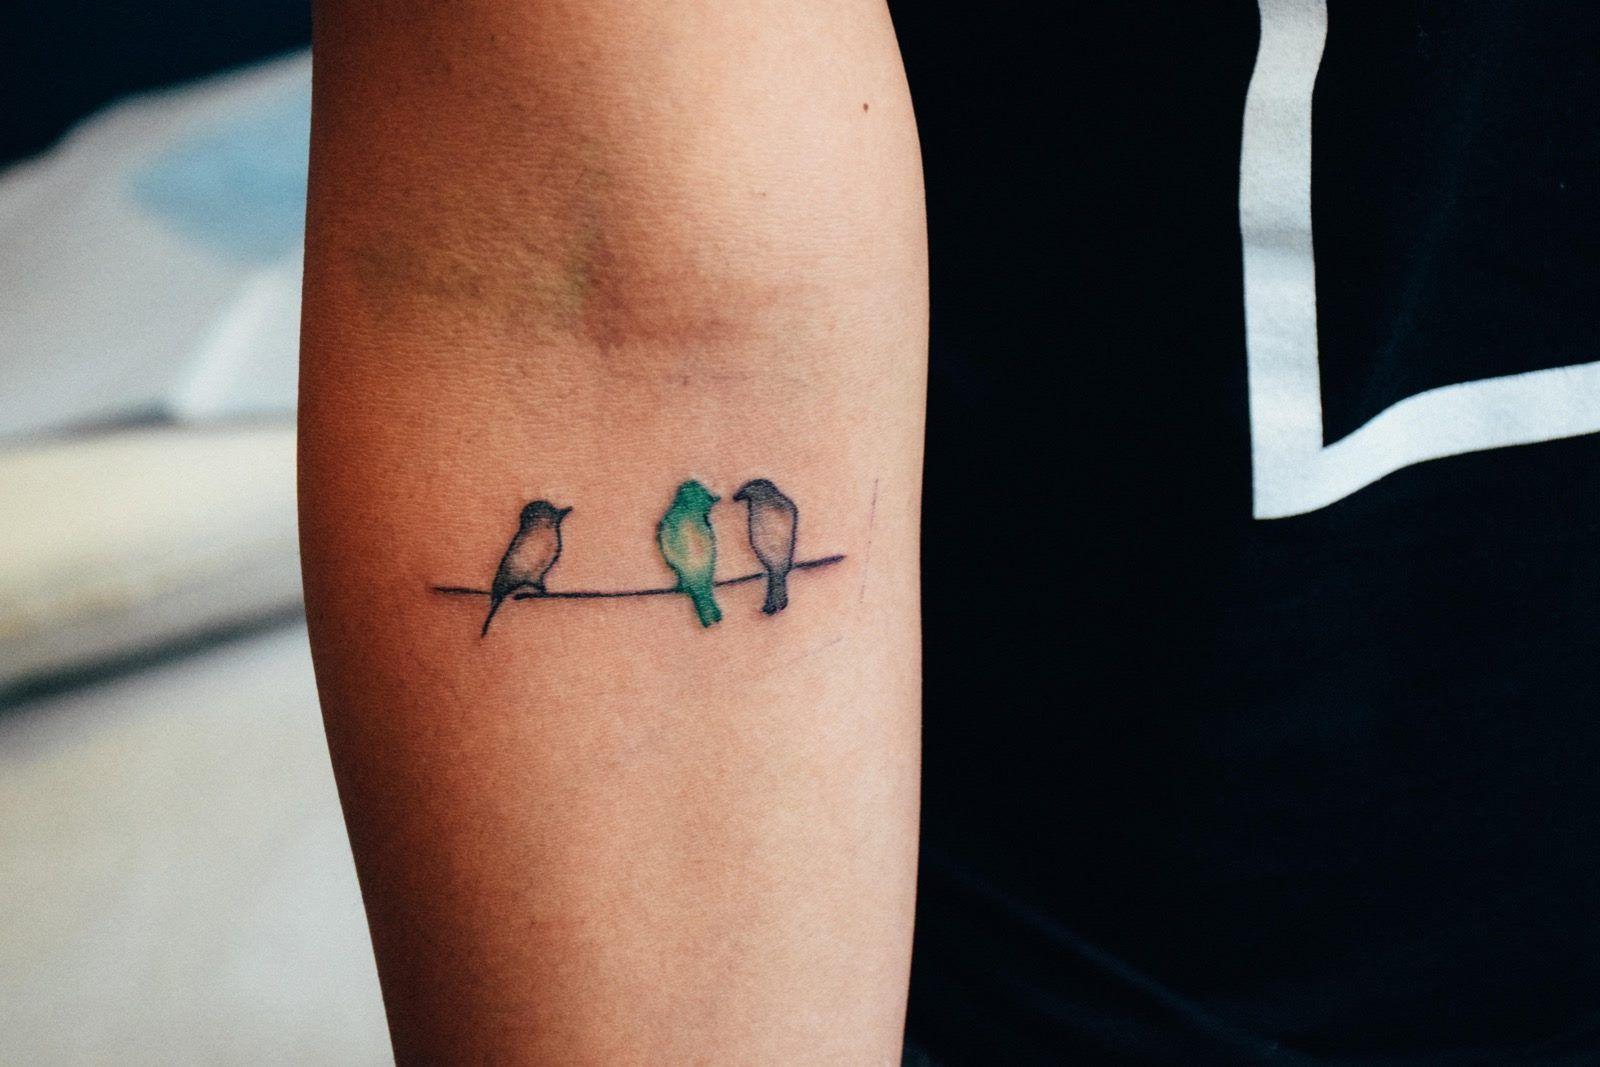 Tattoo Small Birds: Three Little Birds Done By Alan // #blacklinestudio